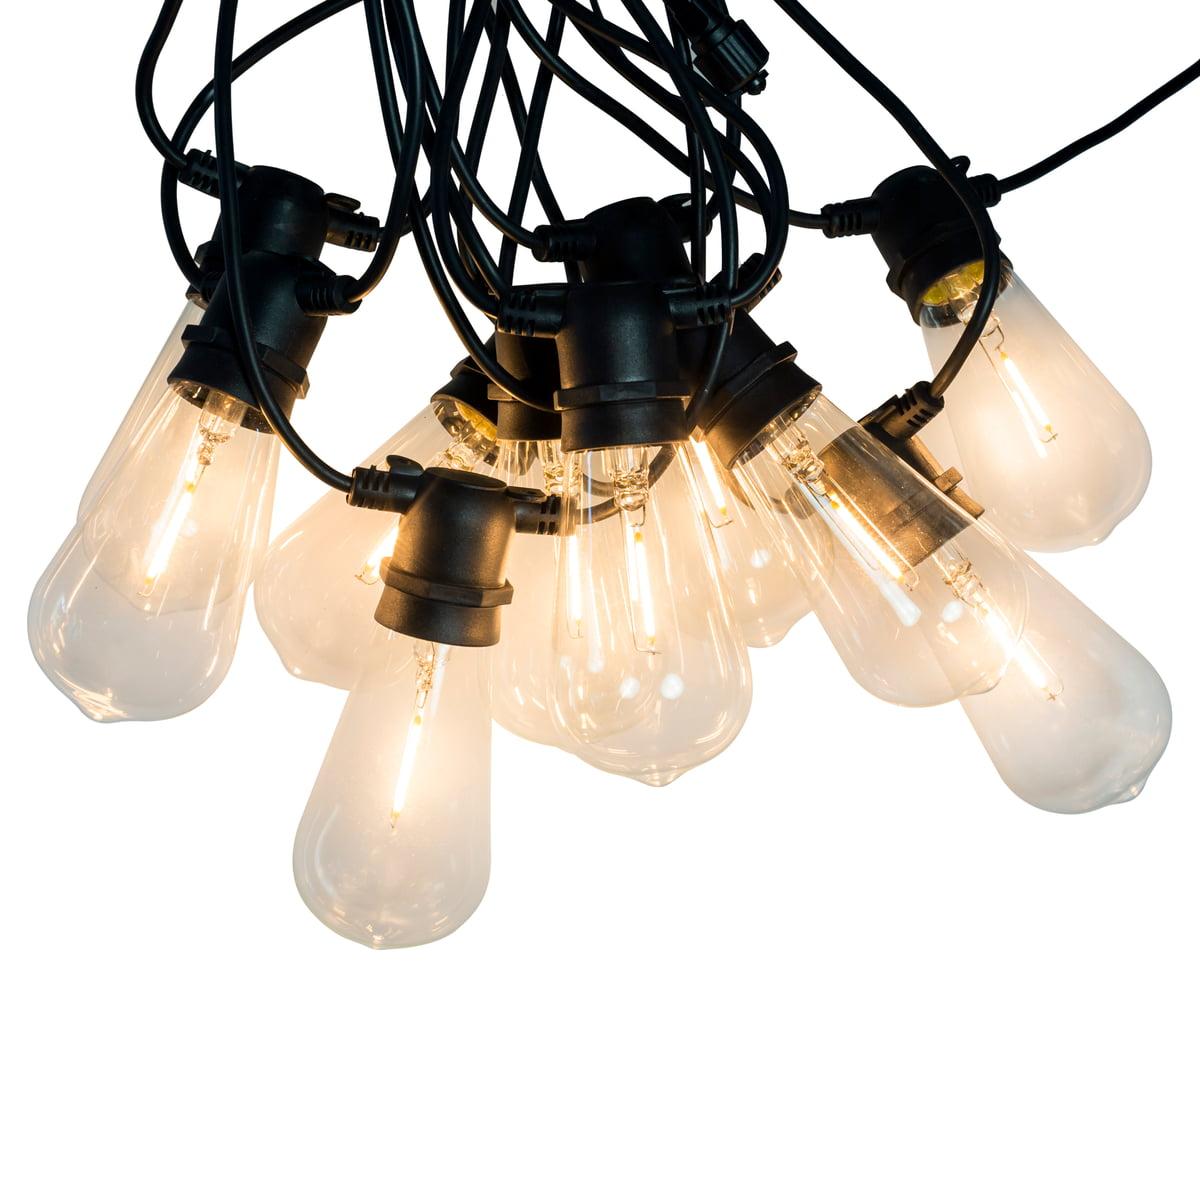 Connox Collection LED Lichterkette IndoorOutdoor (IP 44), 10 Lampen oval, Kabel schwarz